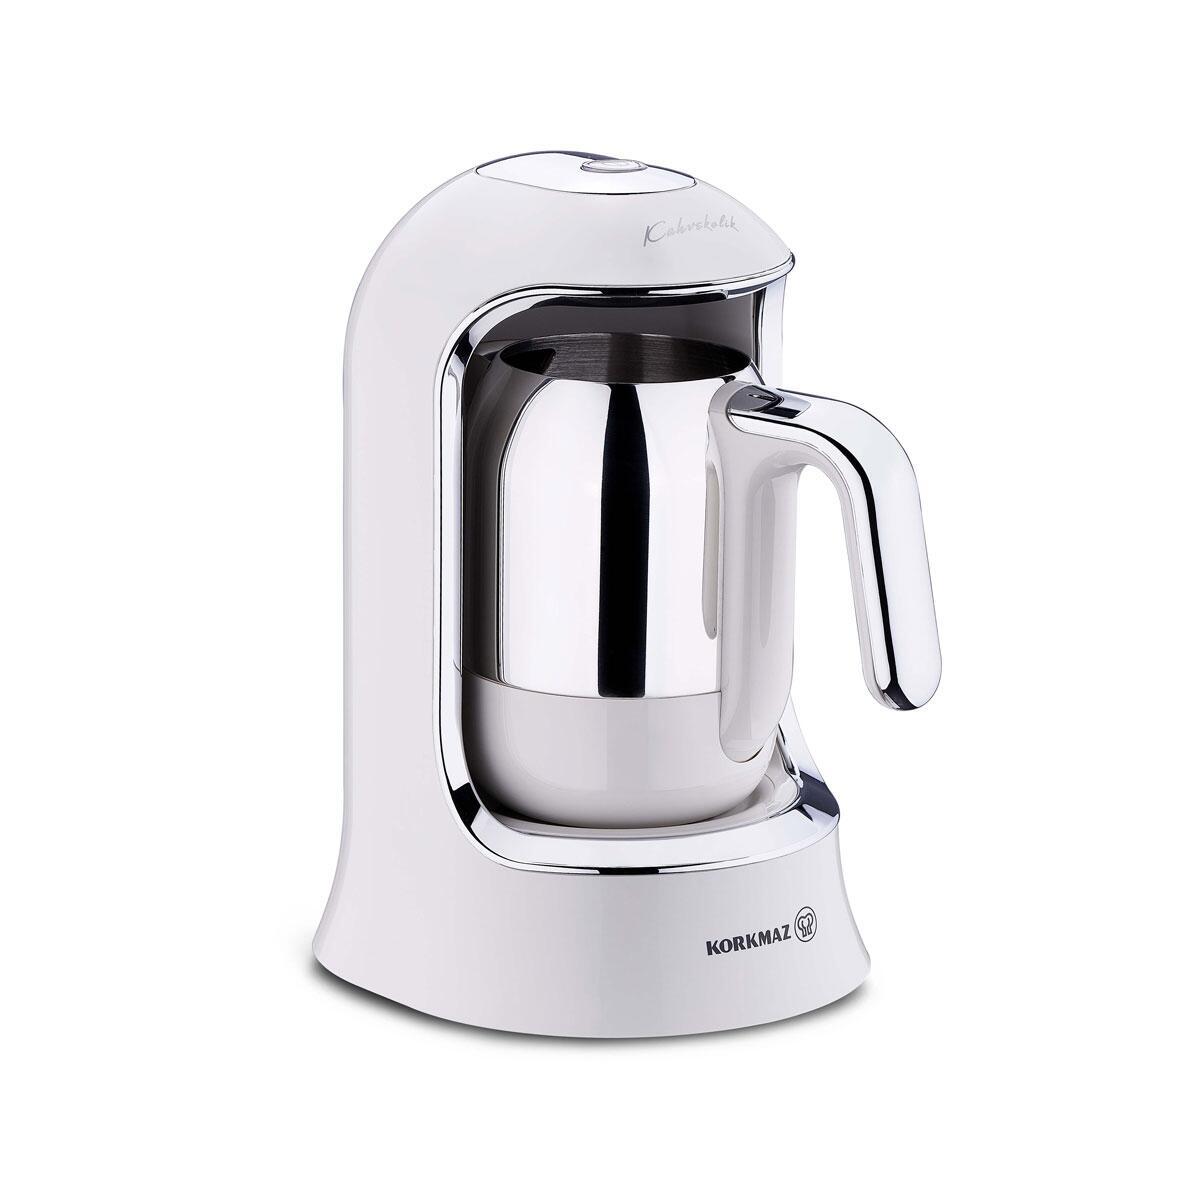 Korkmaz Kahvekolik Otomatik Kahve Makinesi Vanilya